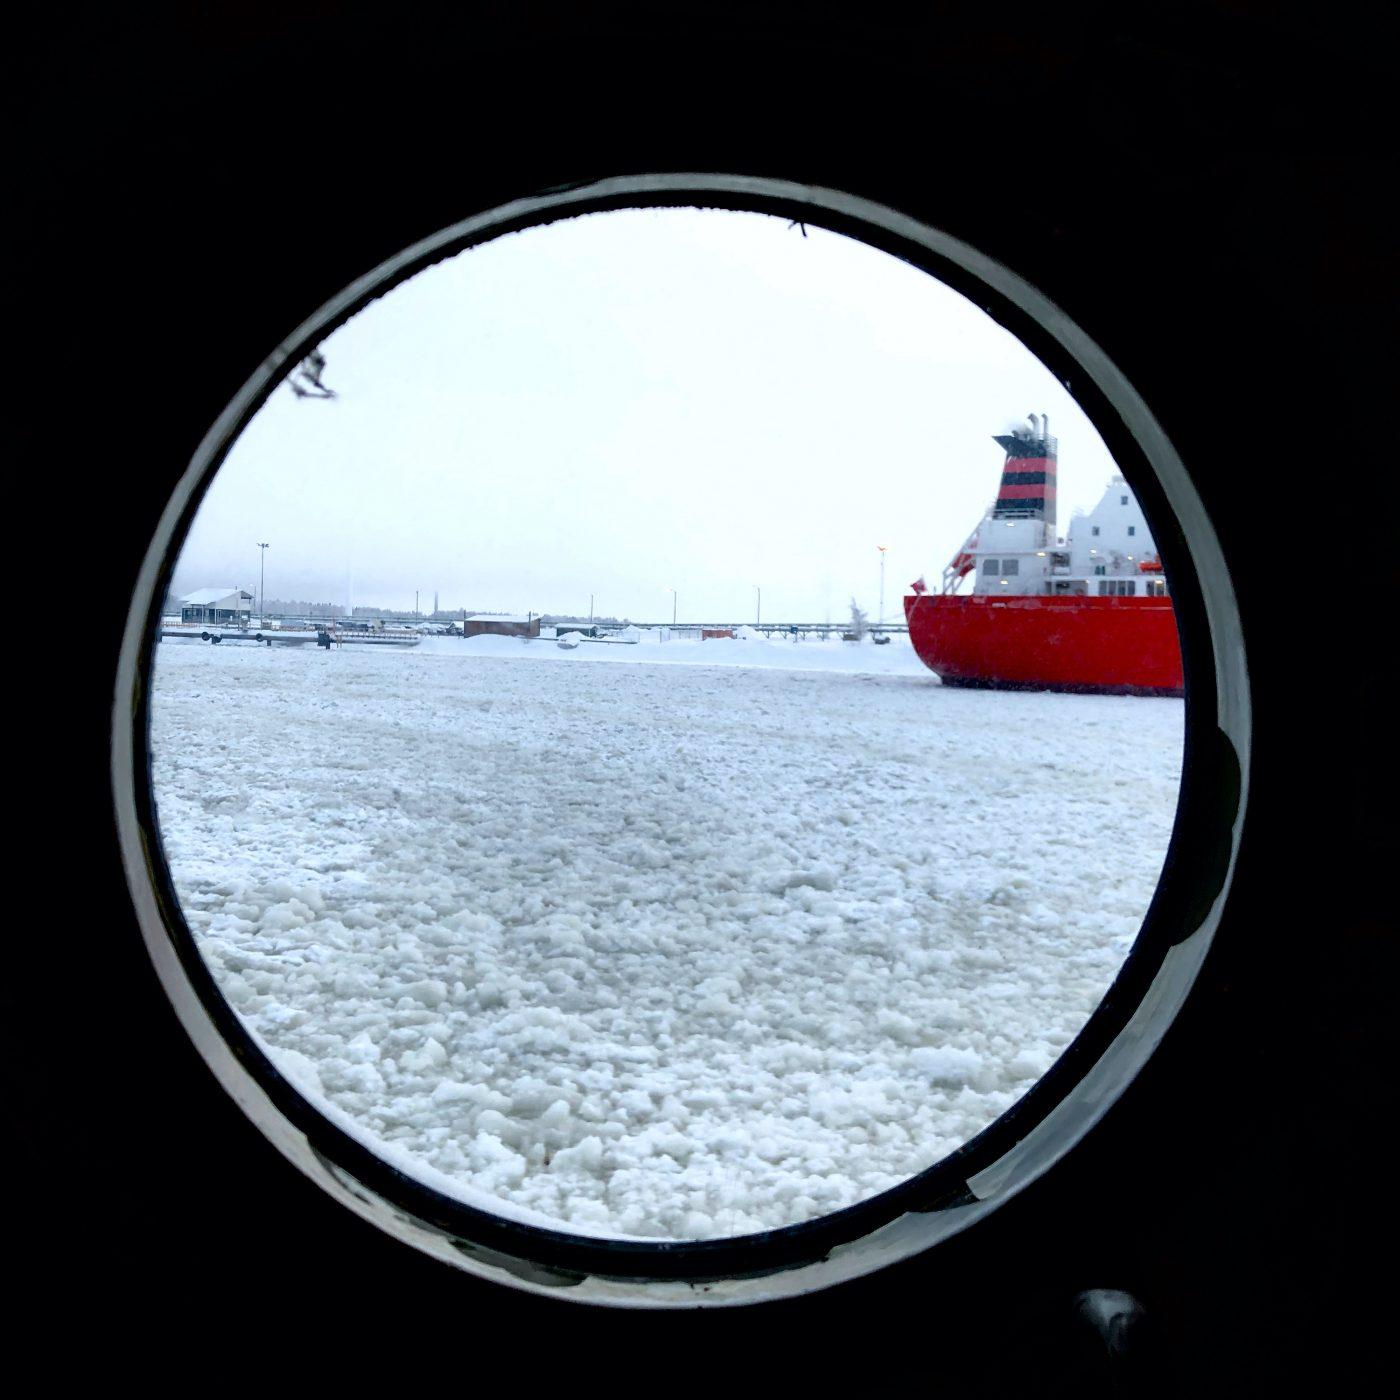 Carole_Glauber_Lapland Journey#1